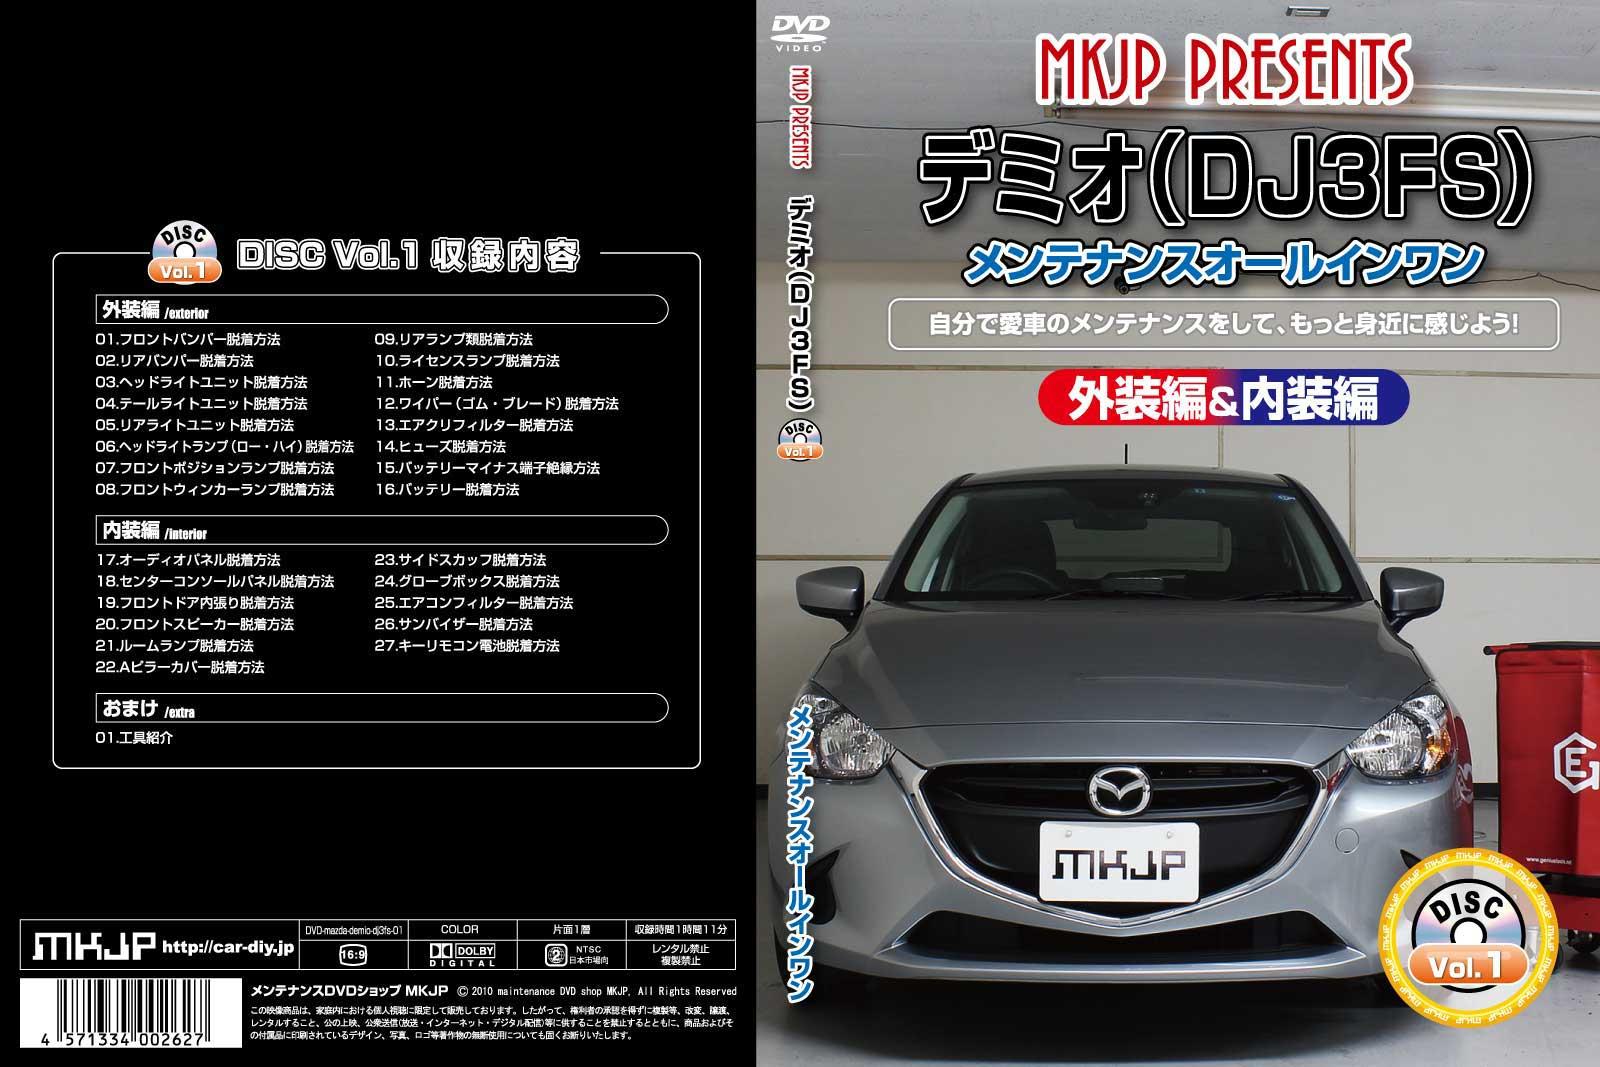 Maintenance DVD shop MKJP | Rakuten Global Market: The maintenance ...